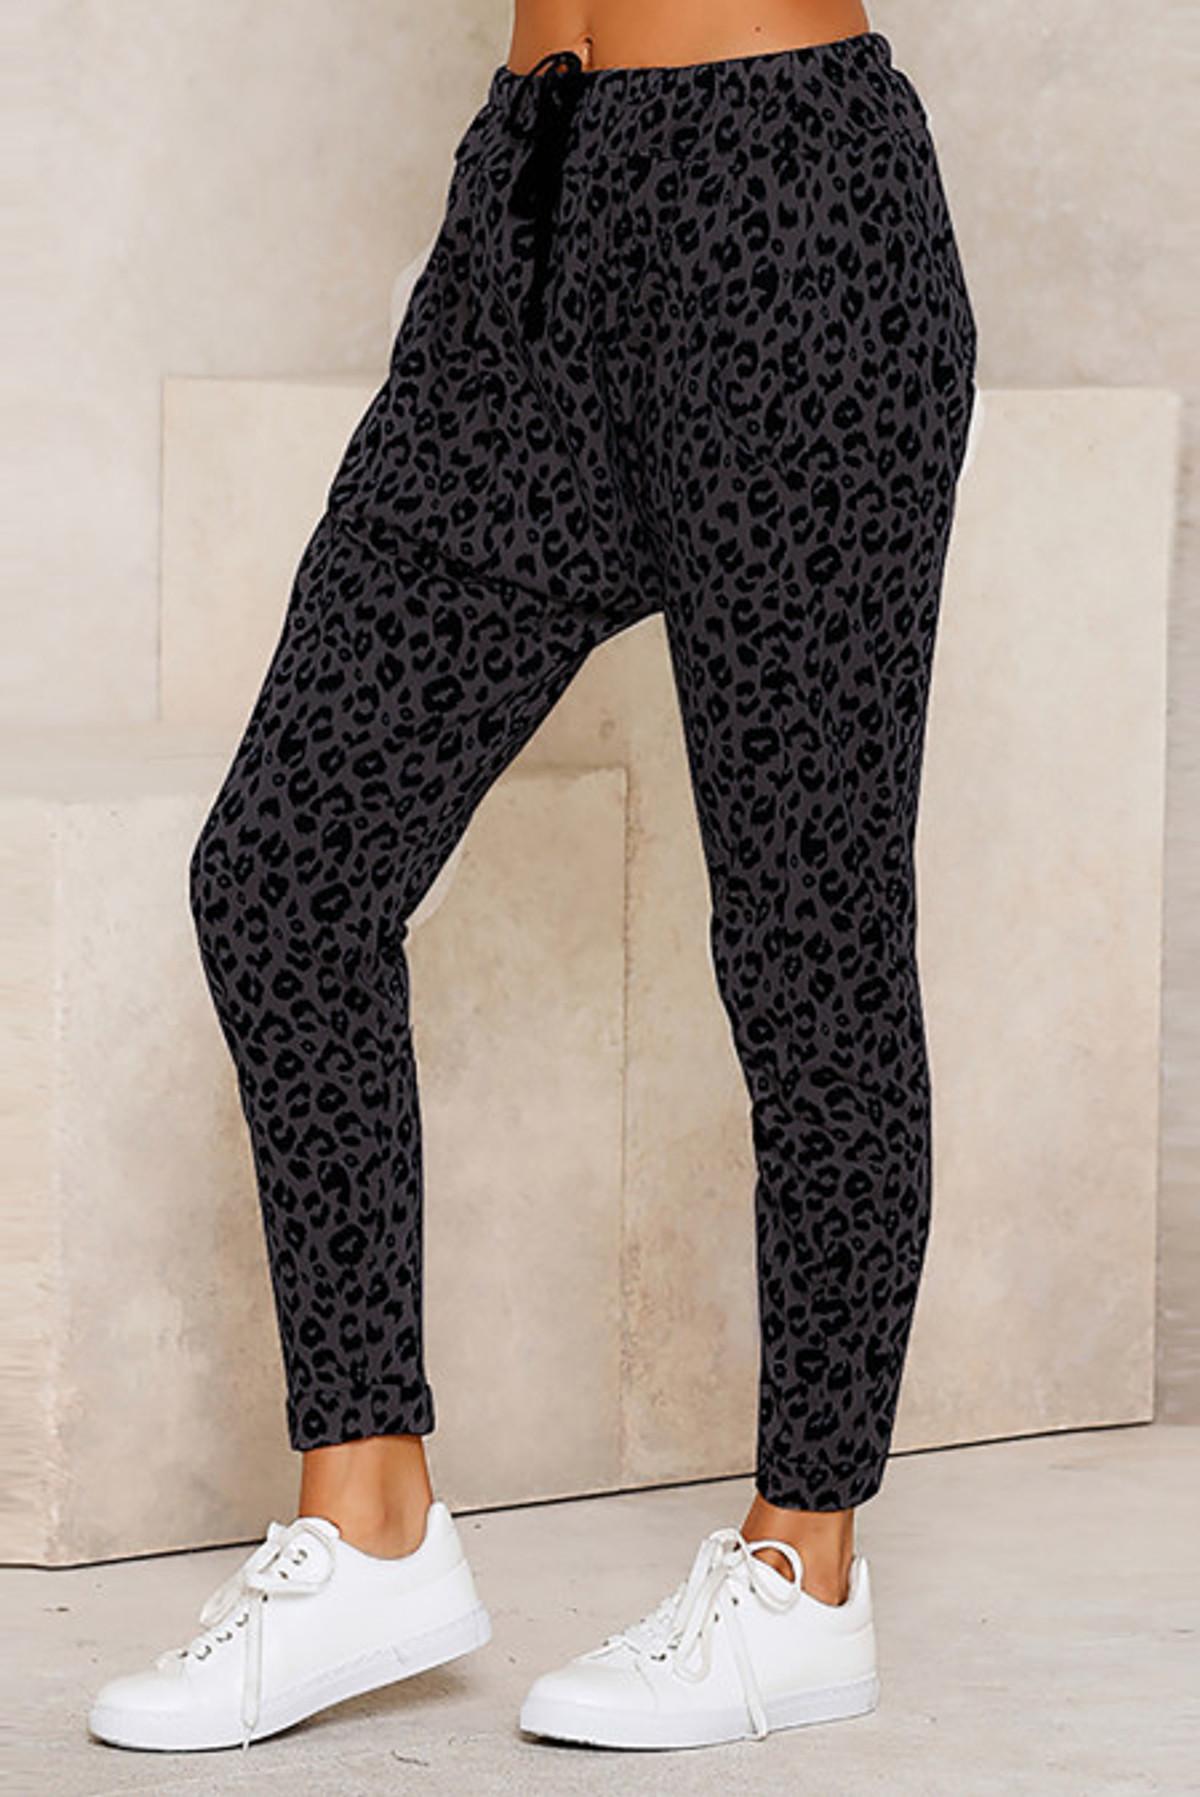 Leopard Print Lounge Pant (FRE77289-2)  FRE772892BL